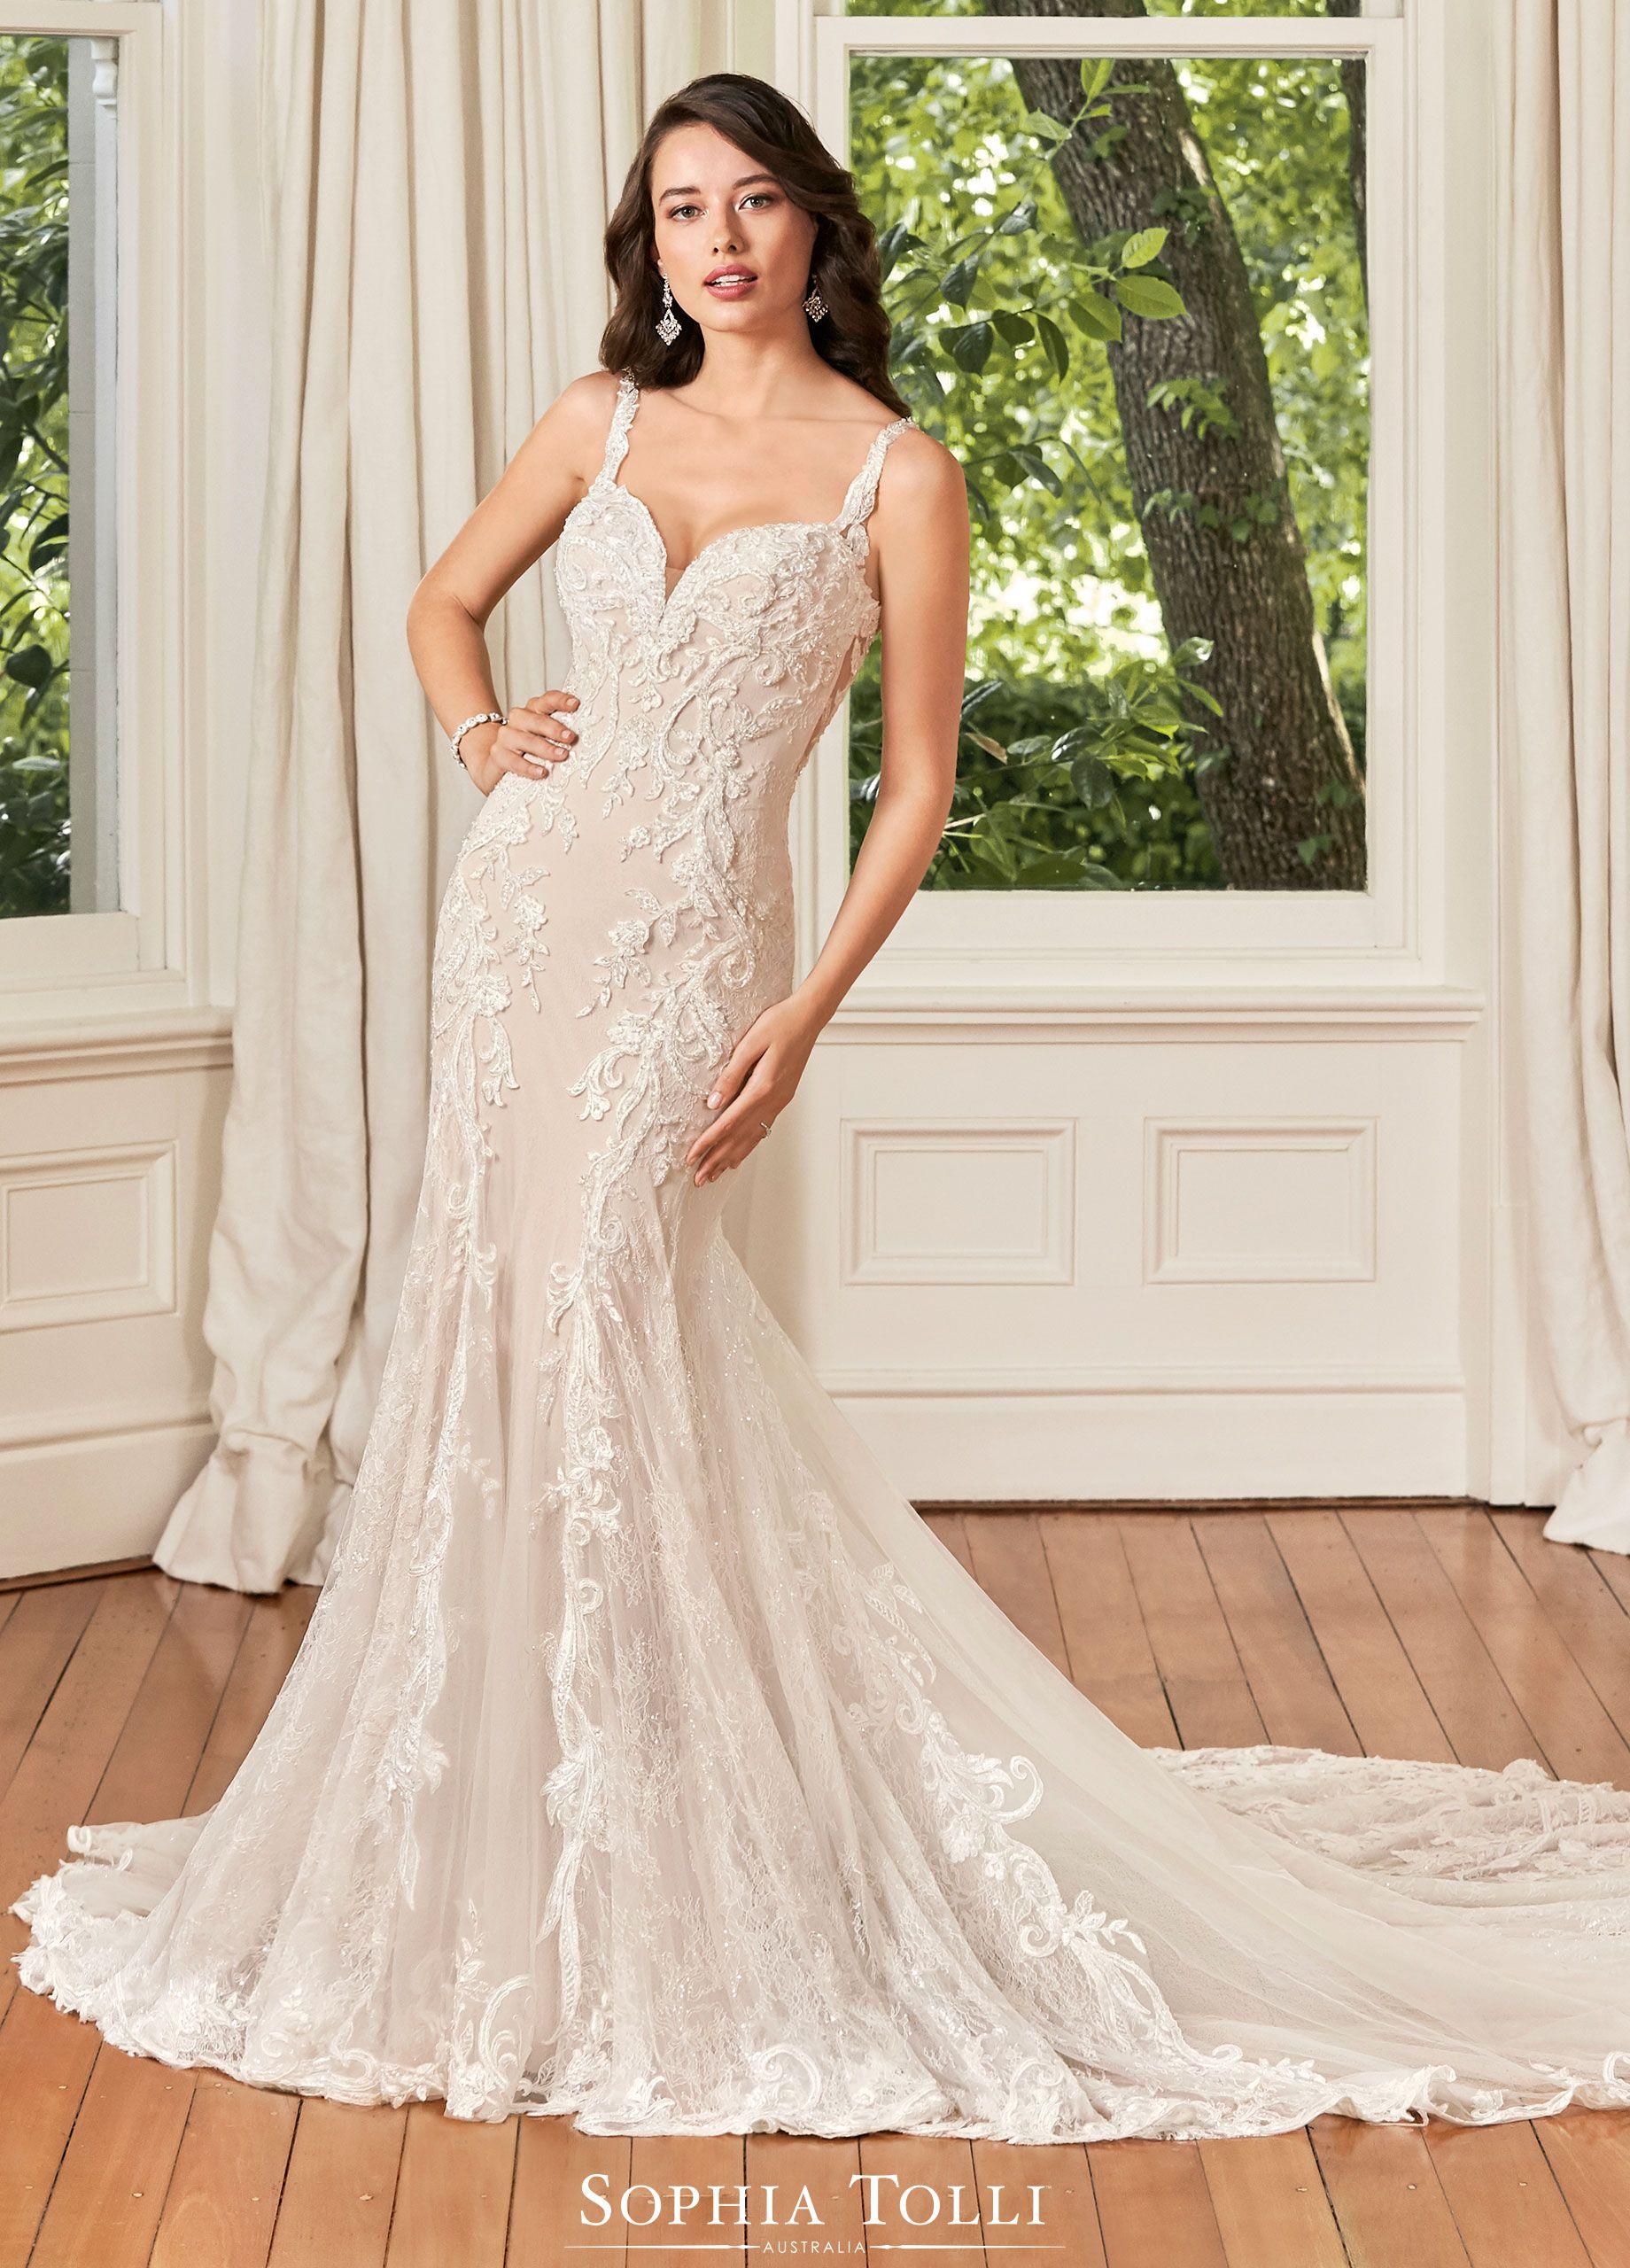 Sophia Tolli Yasmine Wedding Dress Prices Wedding Dresses Designer Bridal Gowns